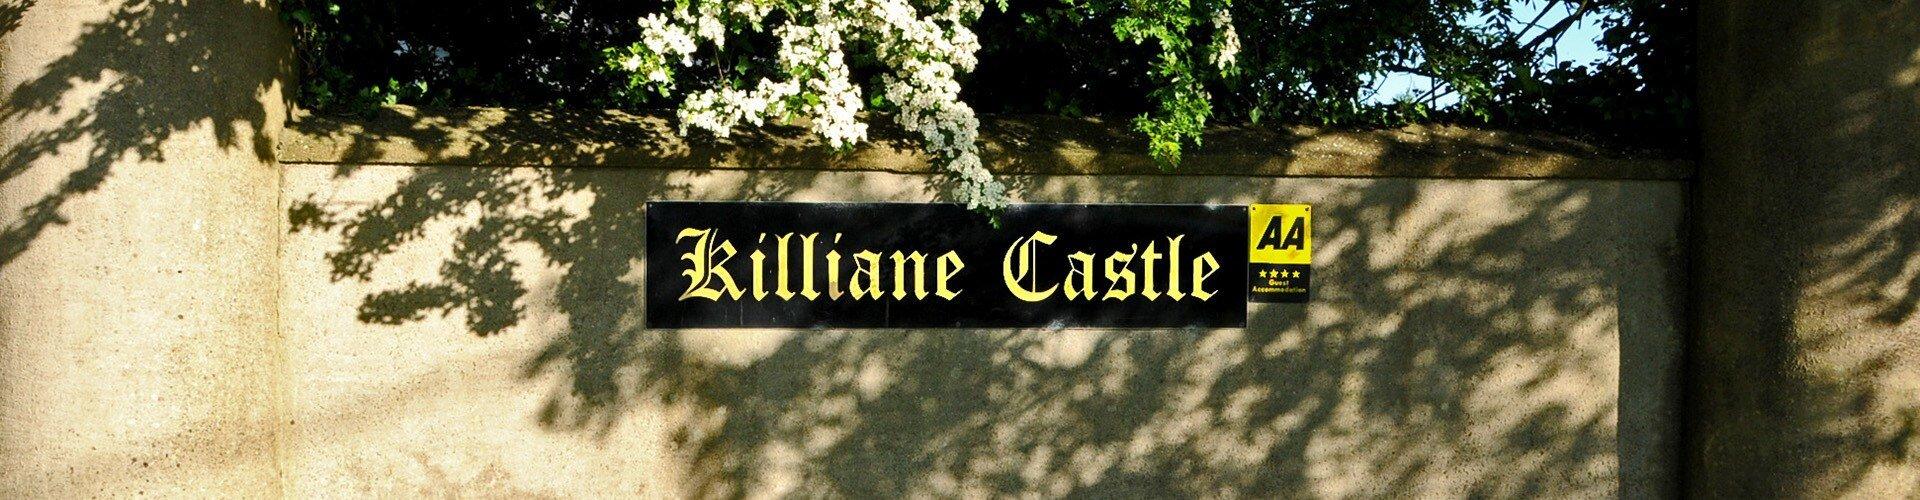 Killiane Castle AA****